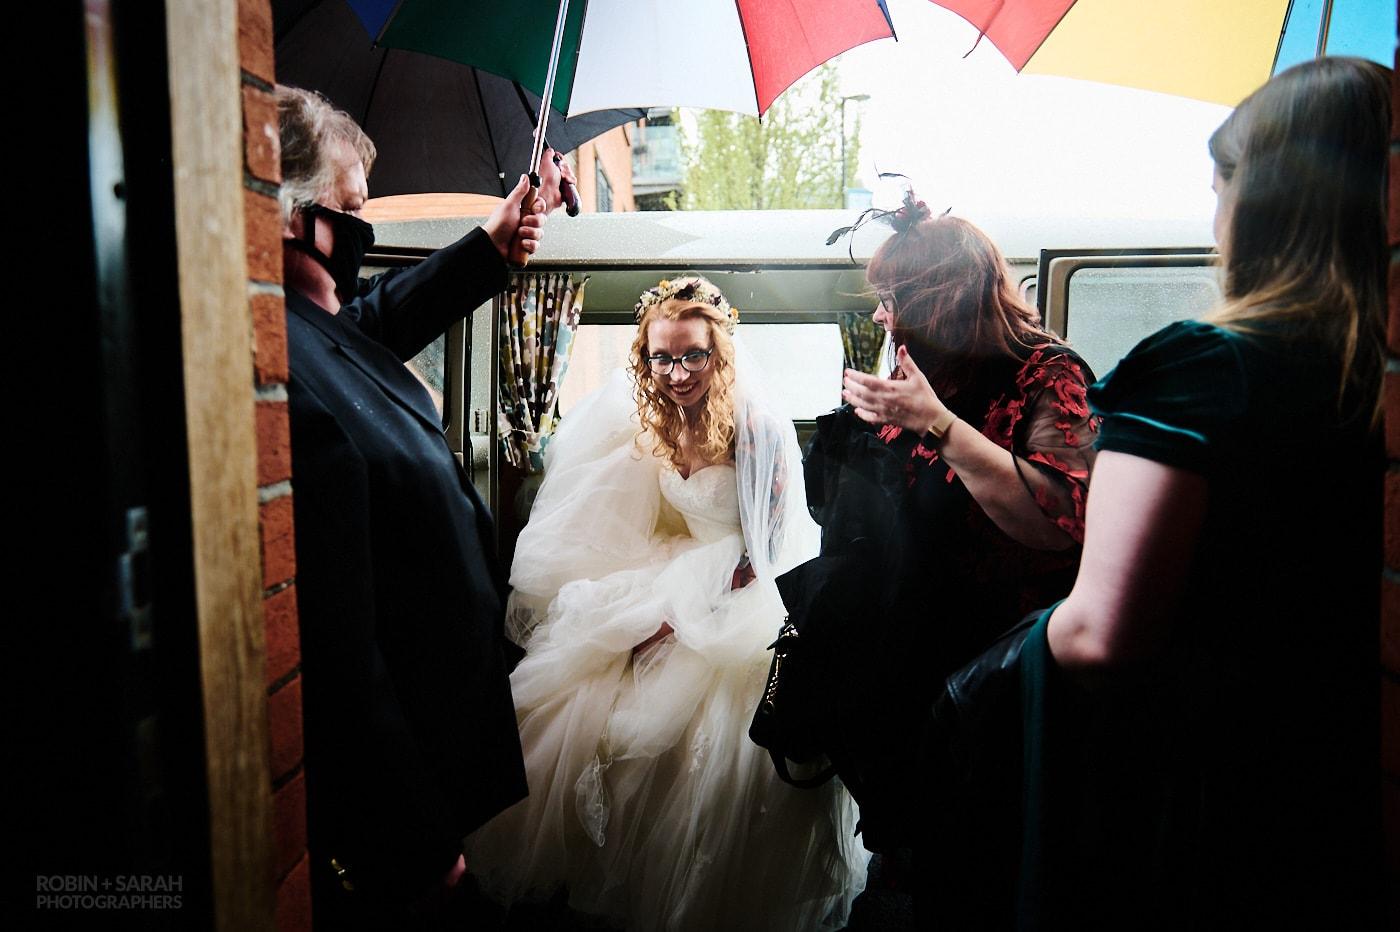 Bride arrives for wedding in camper van as guests hold up umbrellas for her